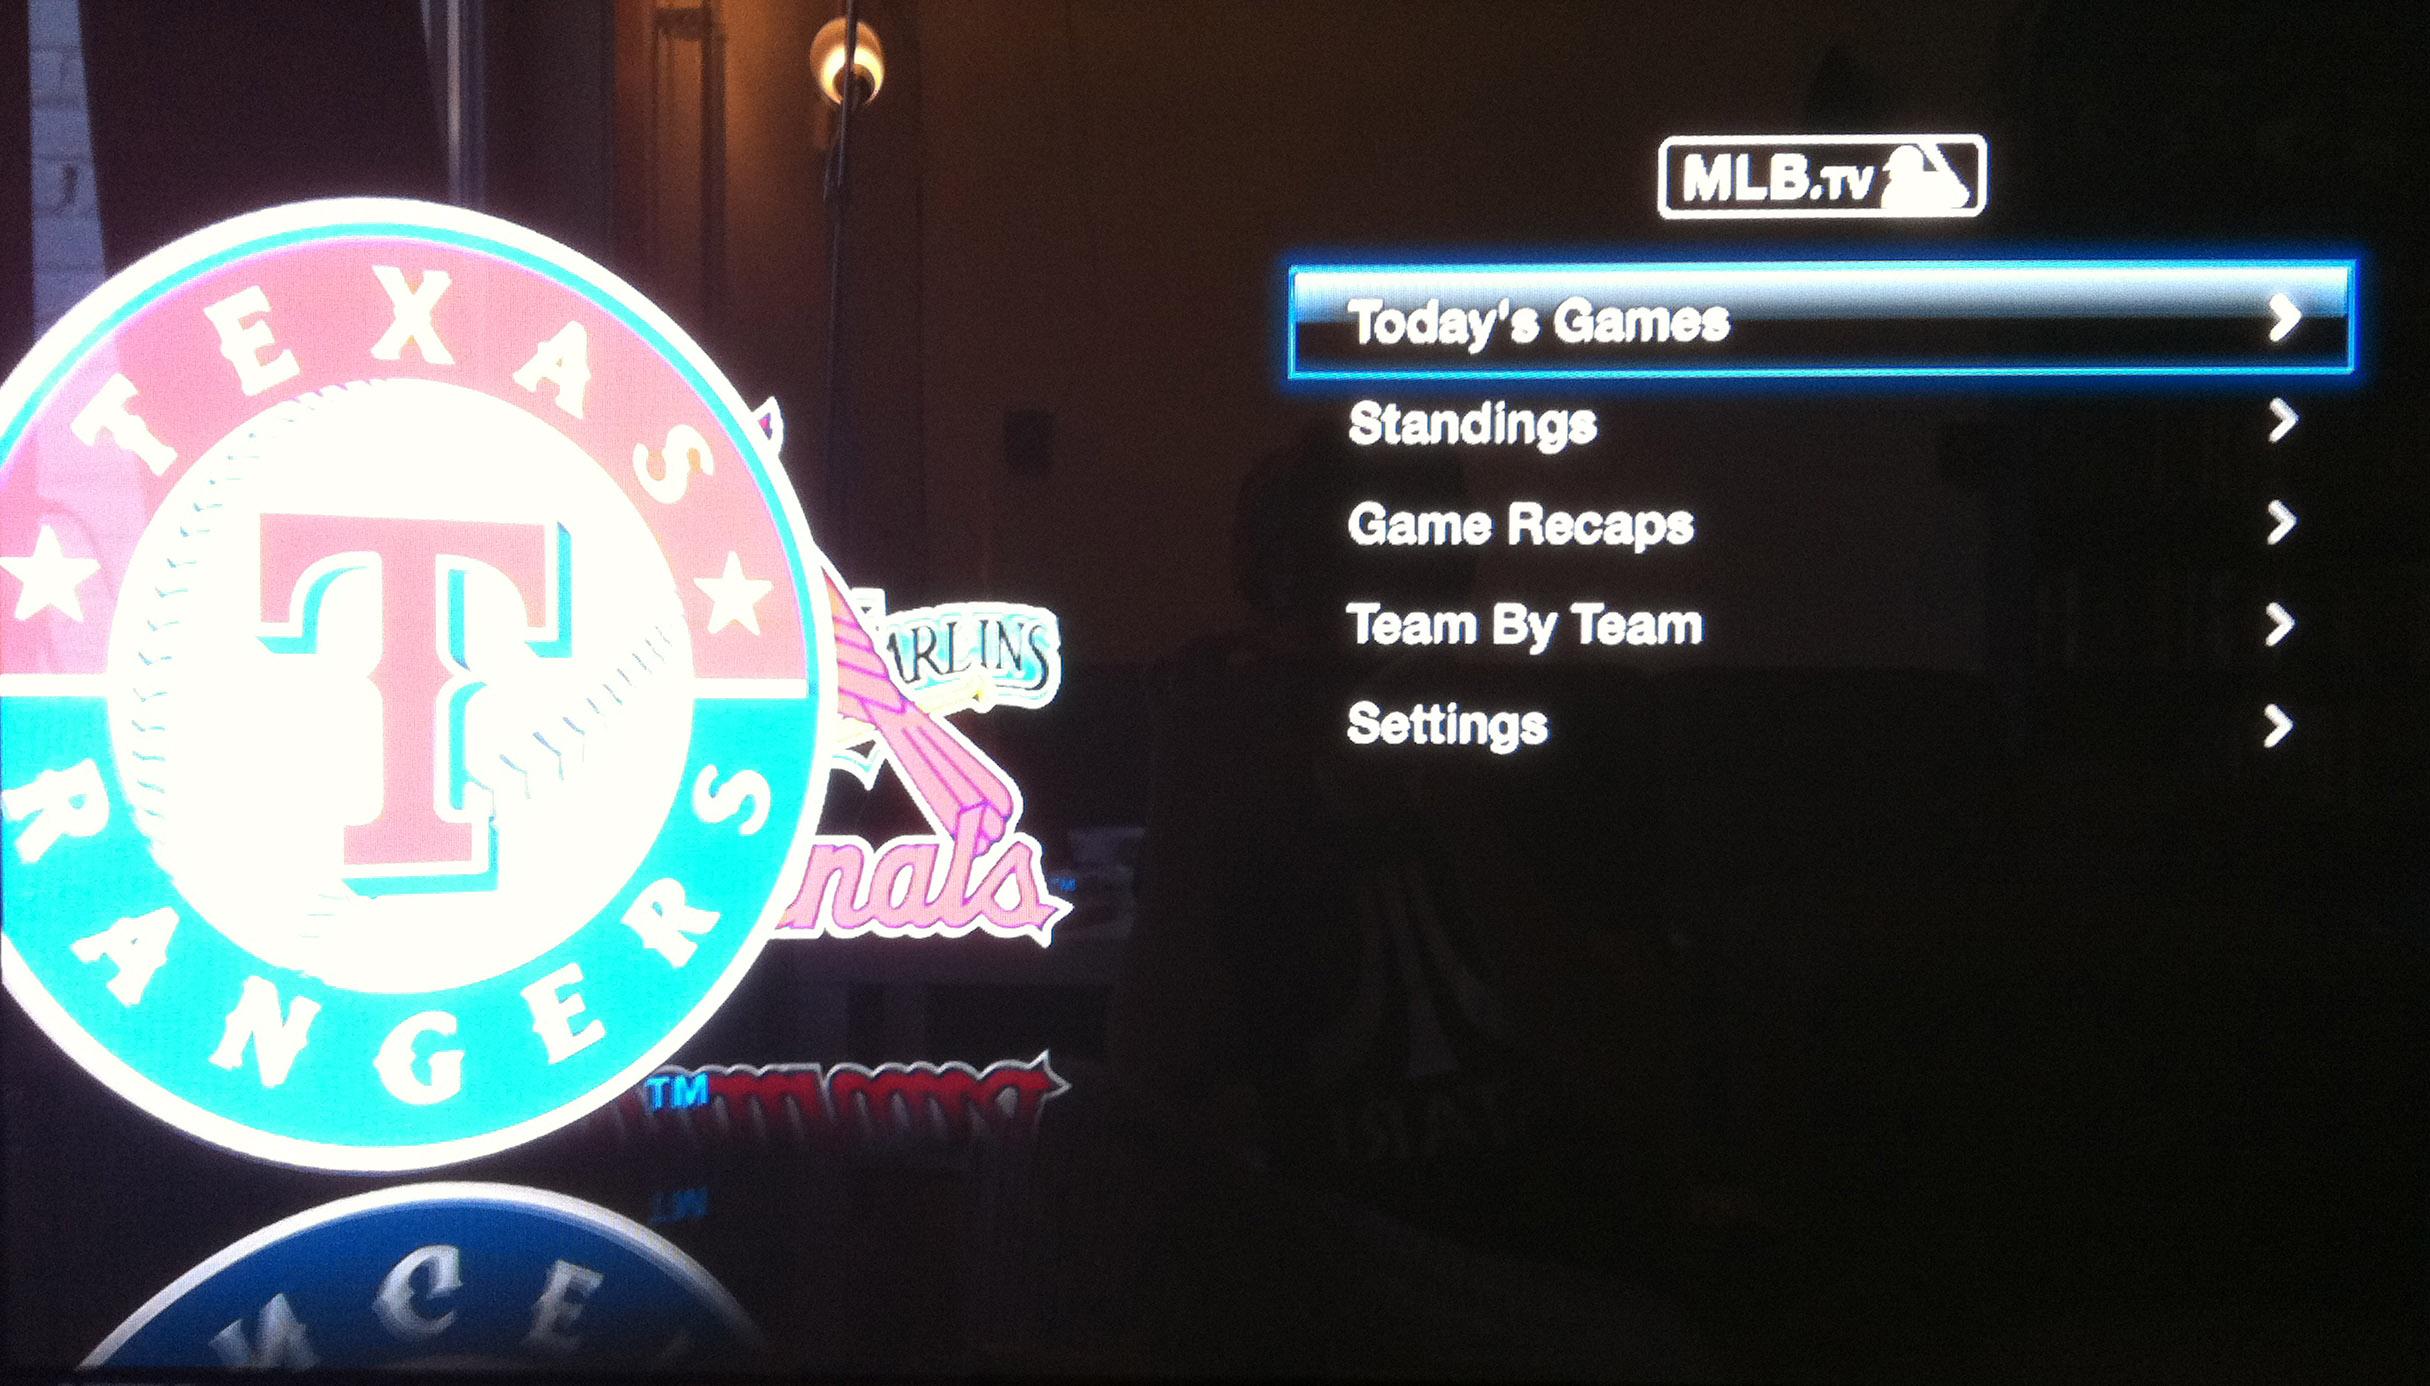 MLB.tv Apple TV